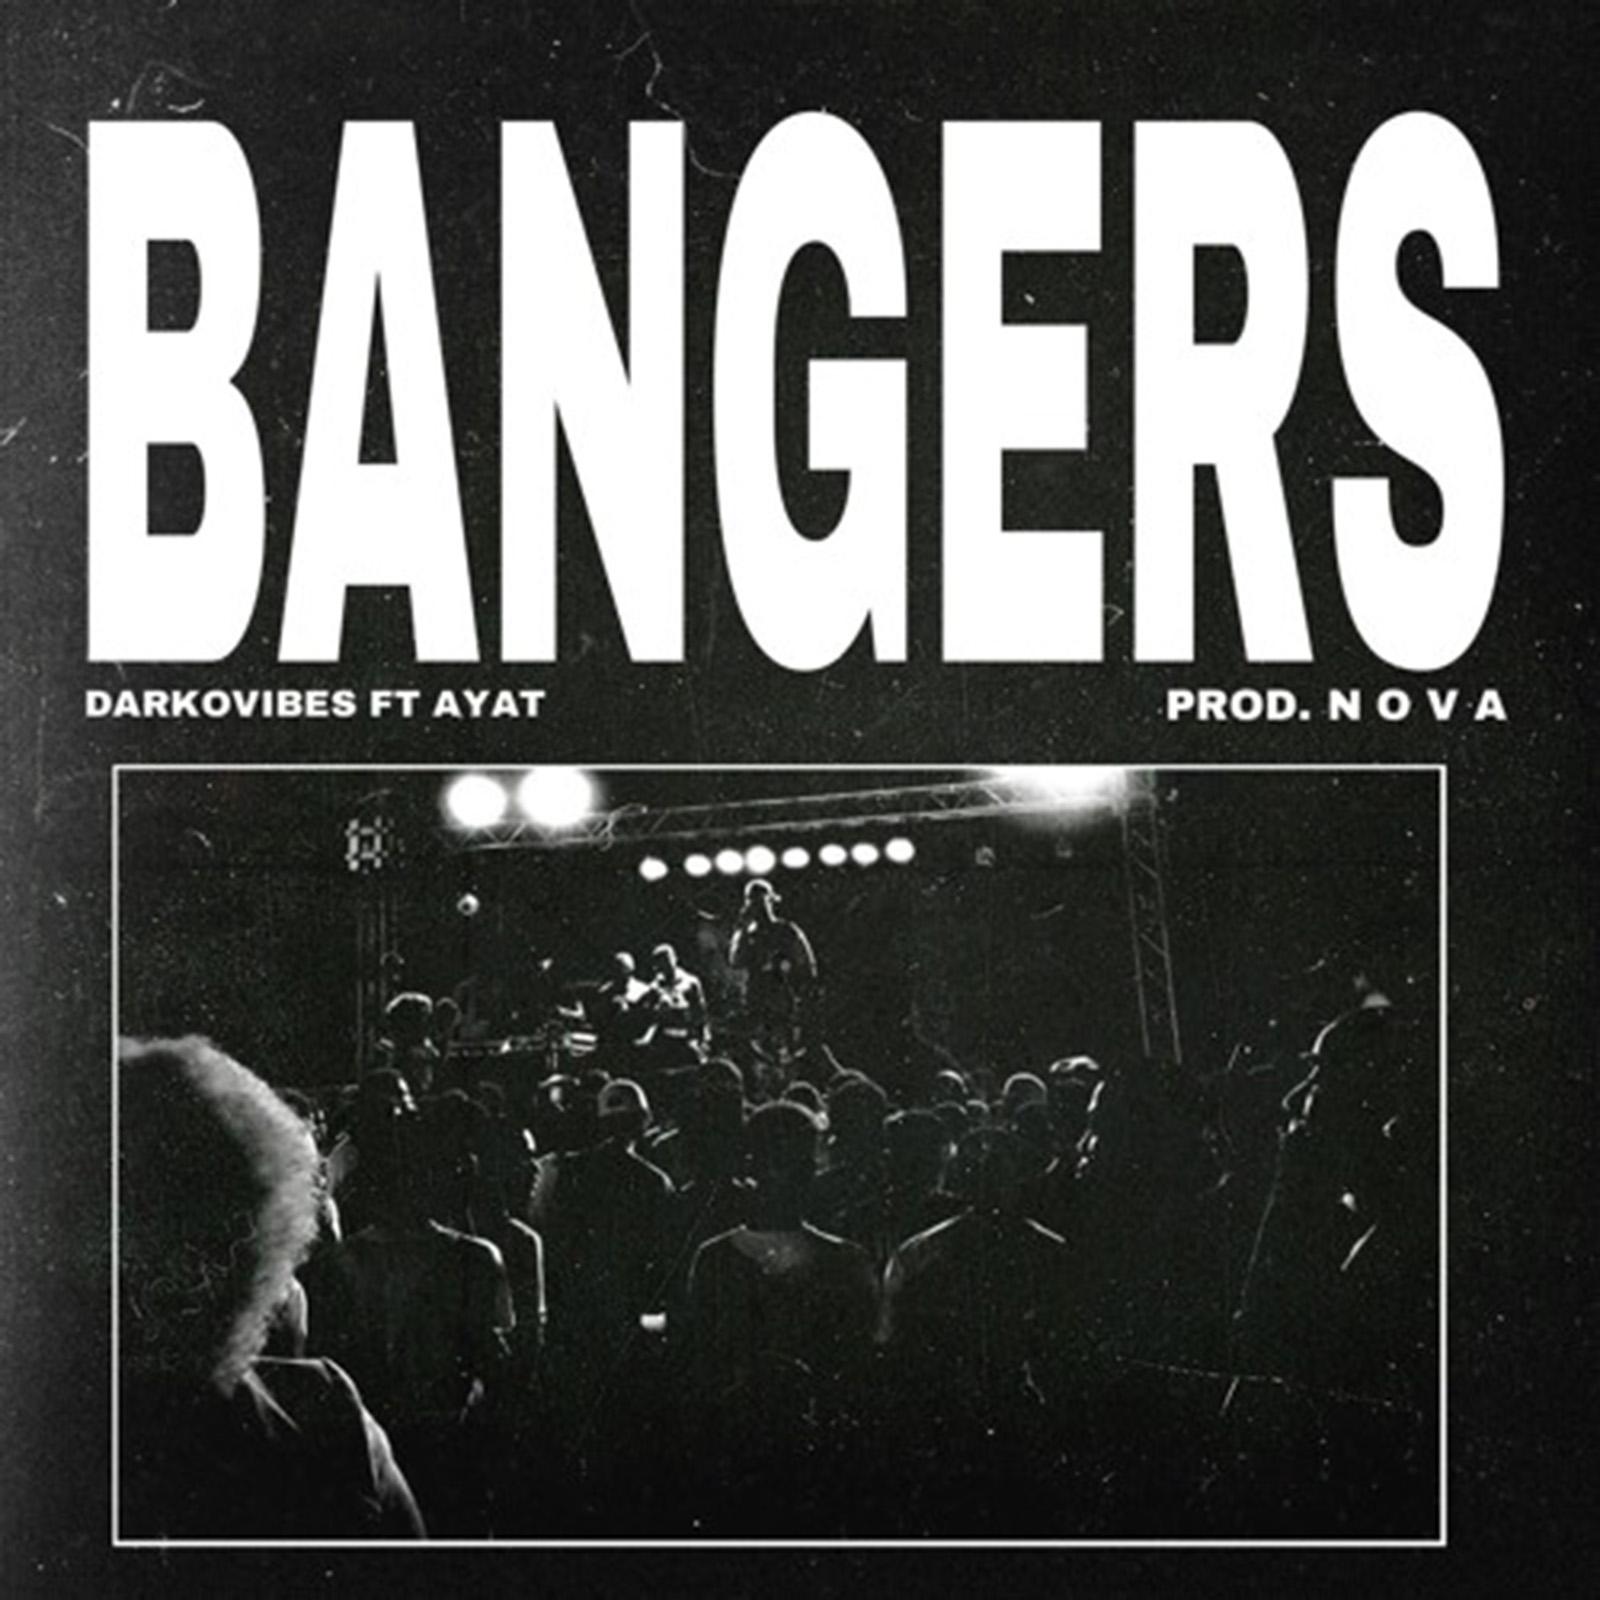 Bangers by Darkovibes feat. AYAT